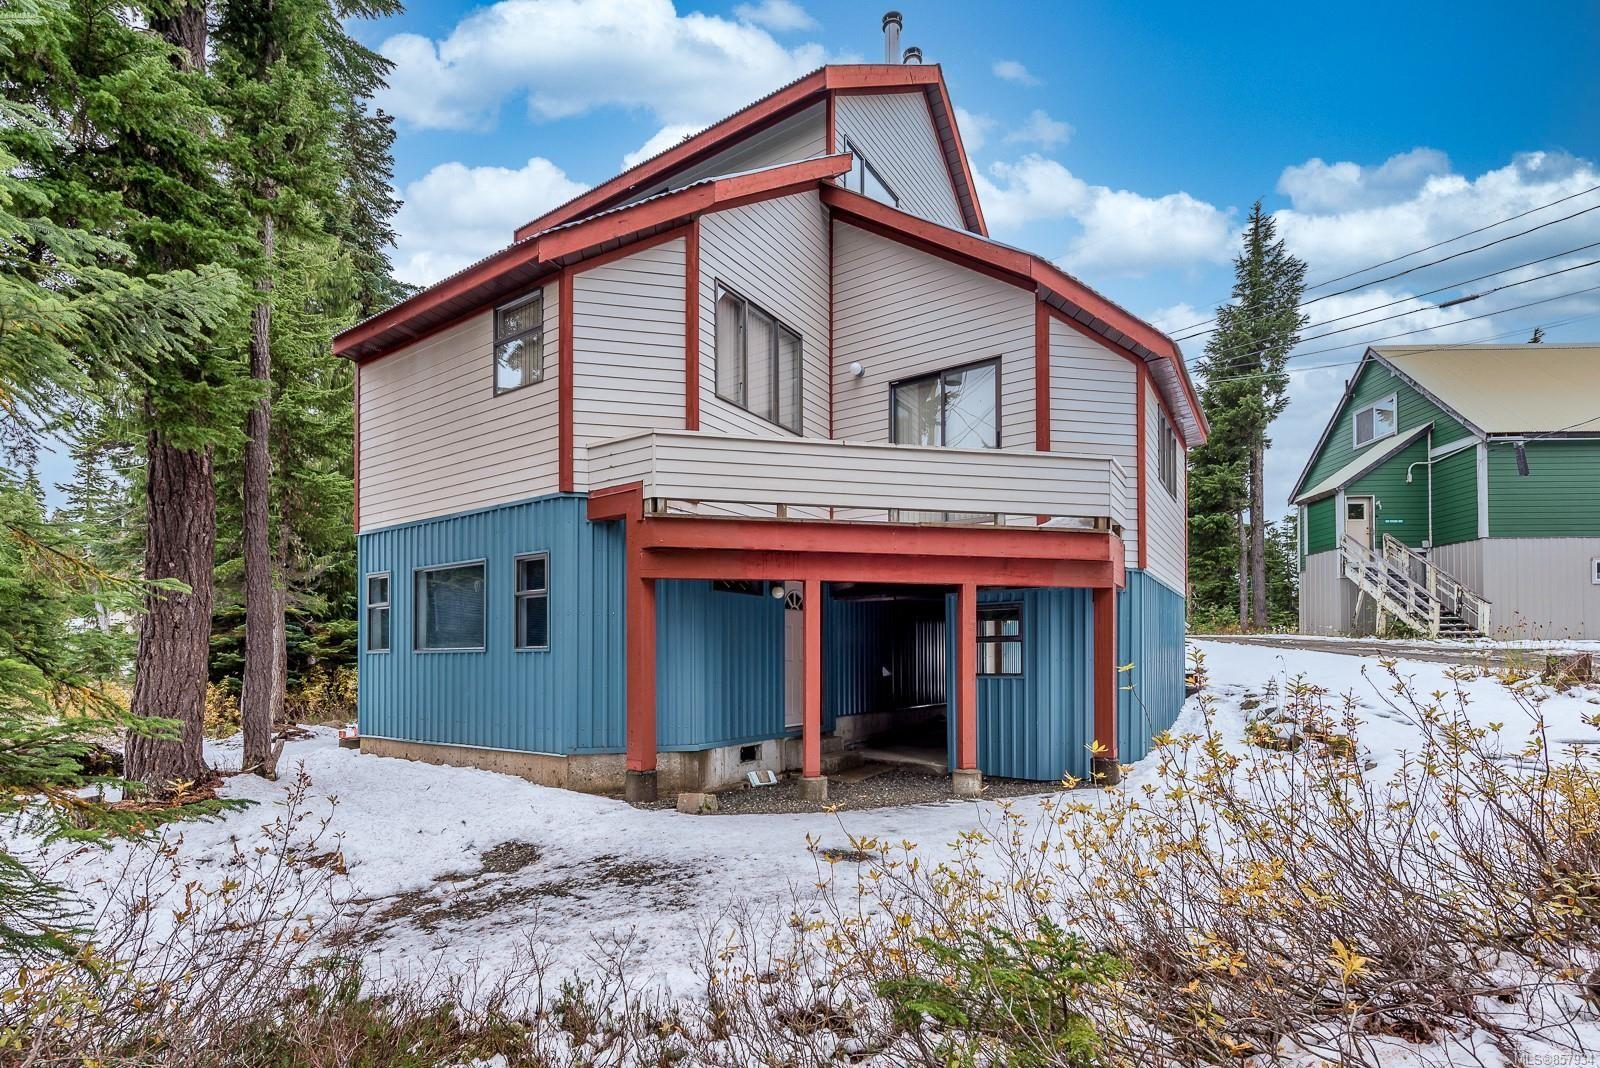 Photo 27: Photos: 998 STRATA Way in : CV Mt Washington House for sale (Comox Valley)  : MLS®# 857934